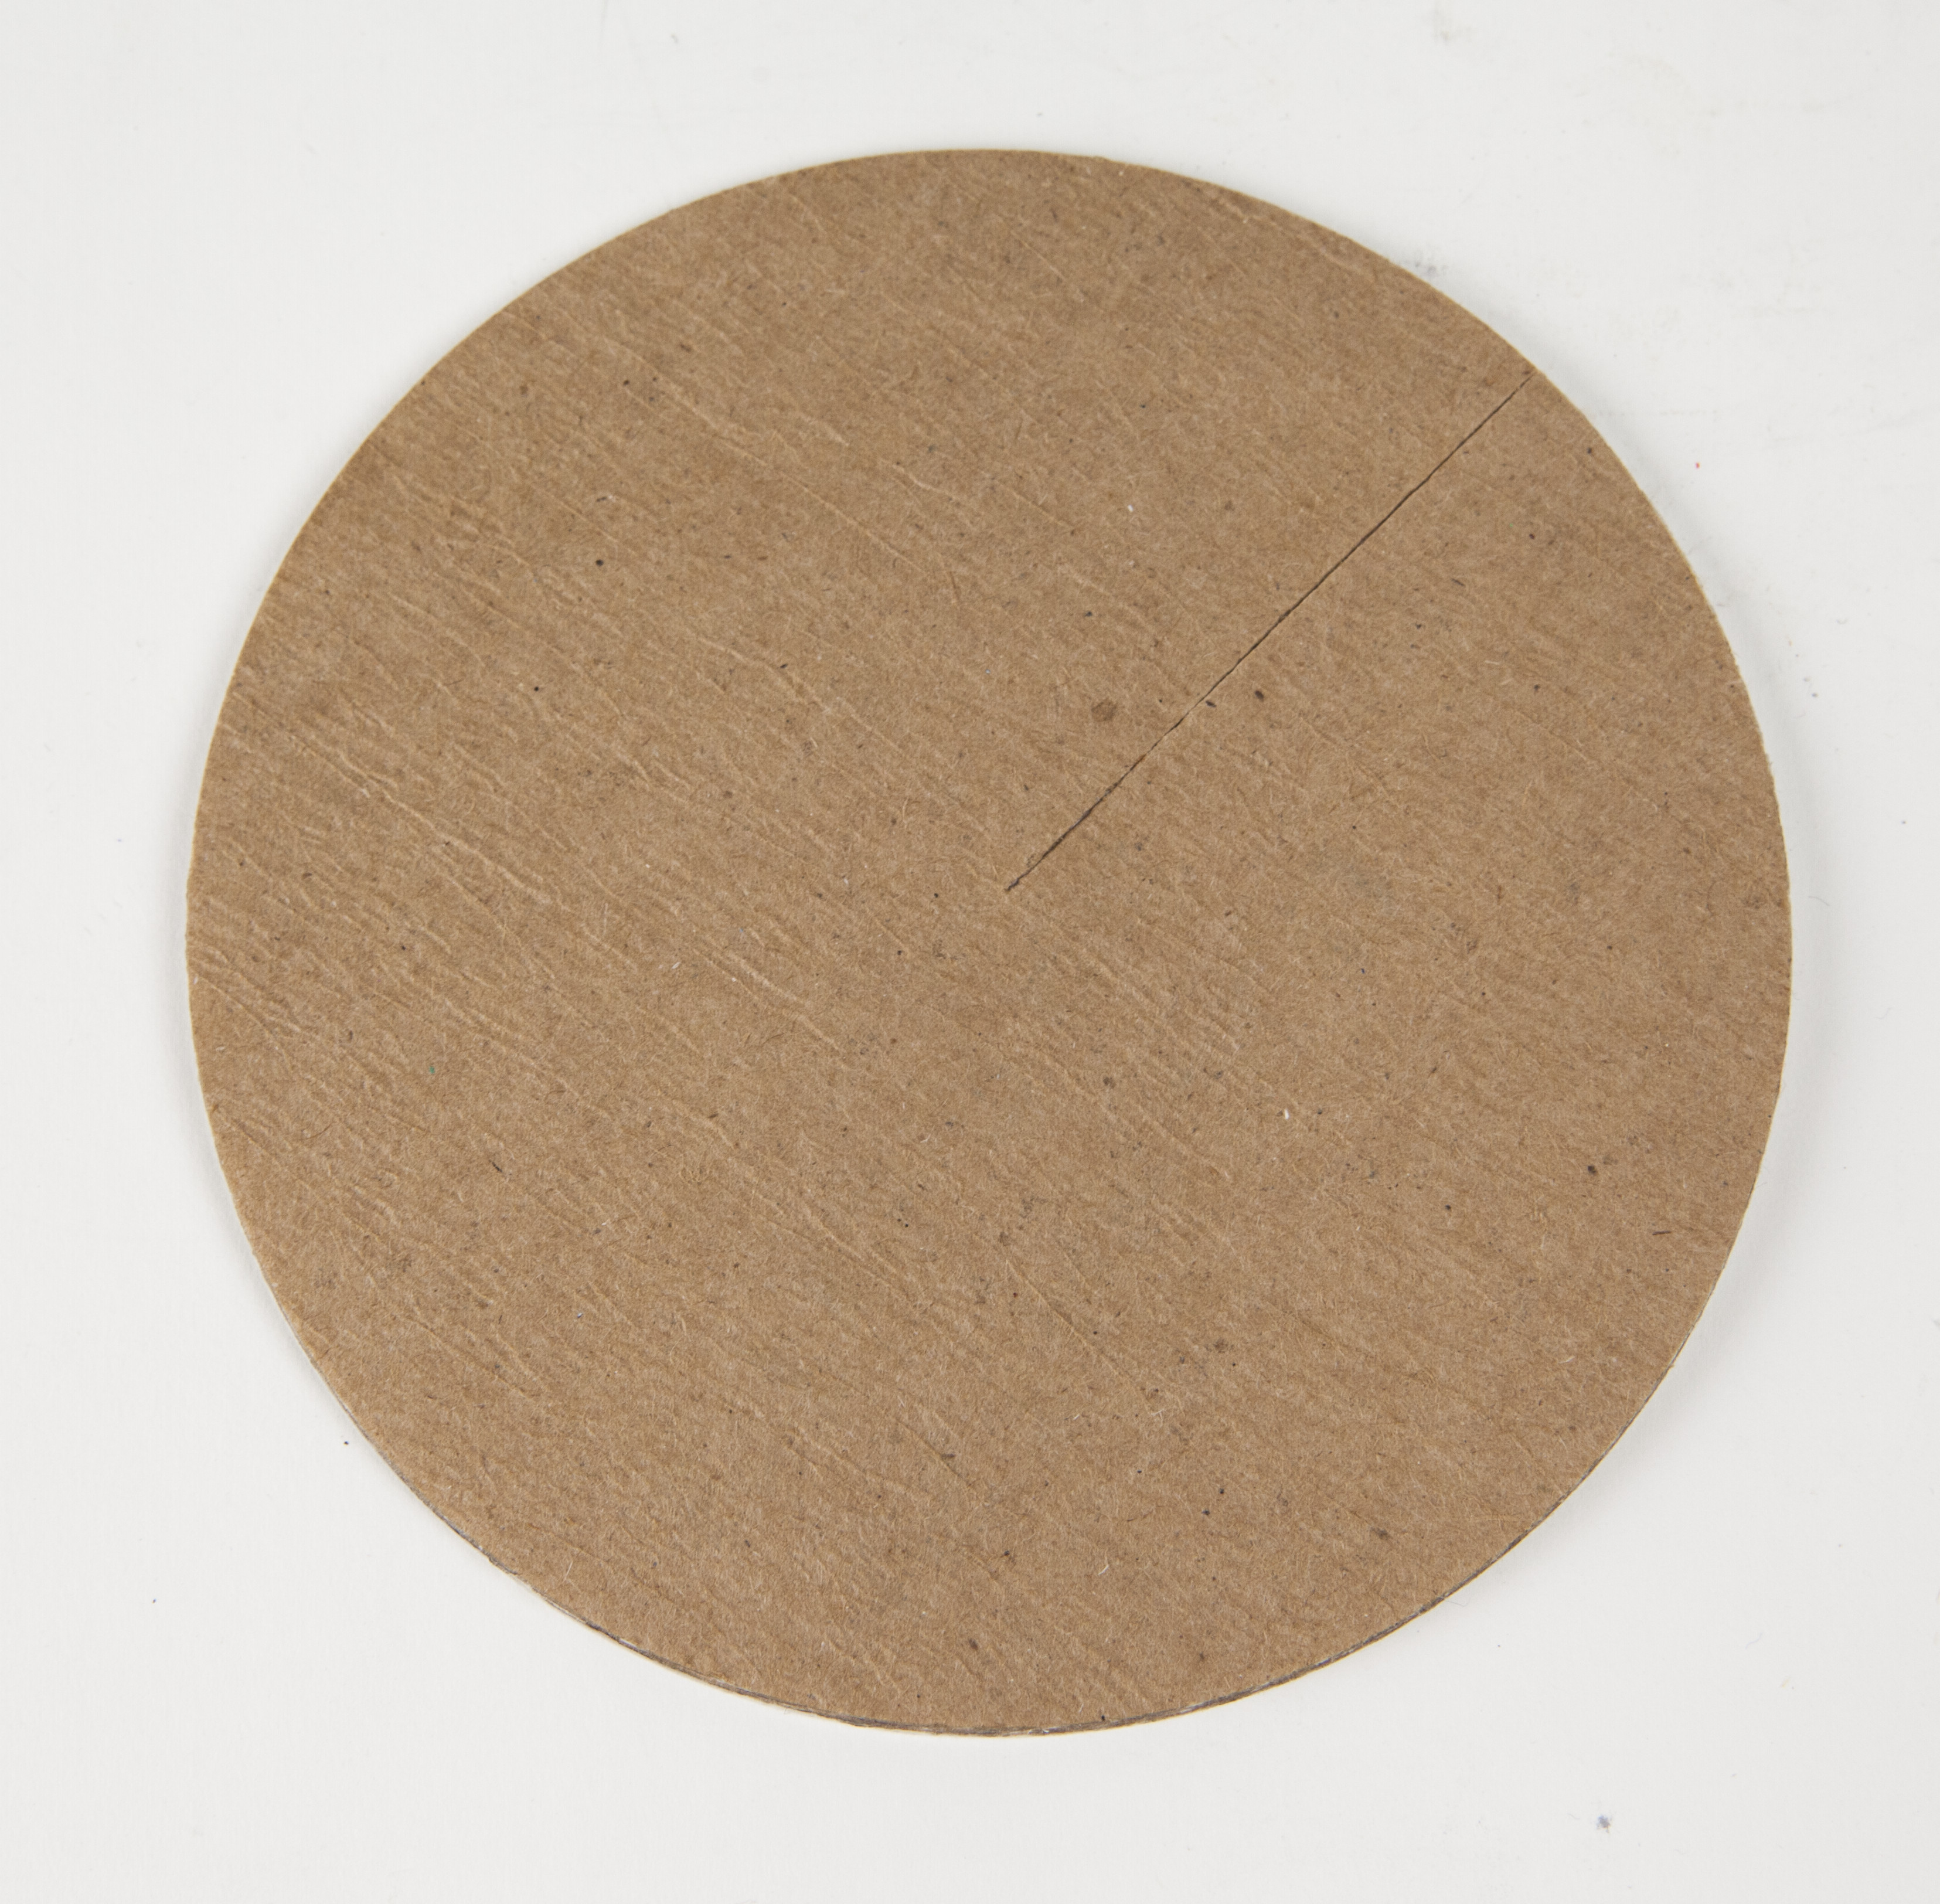 Insta-Hold Discs (1 ea)